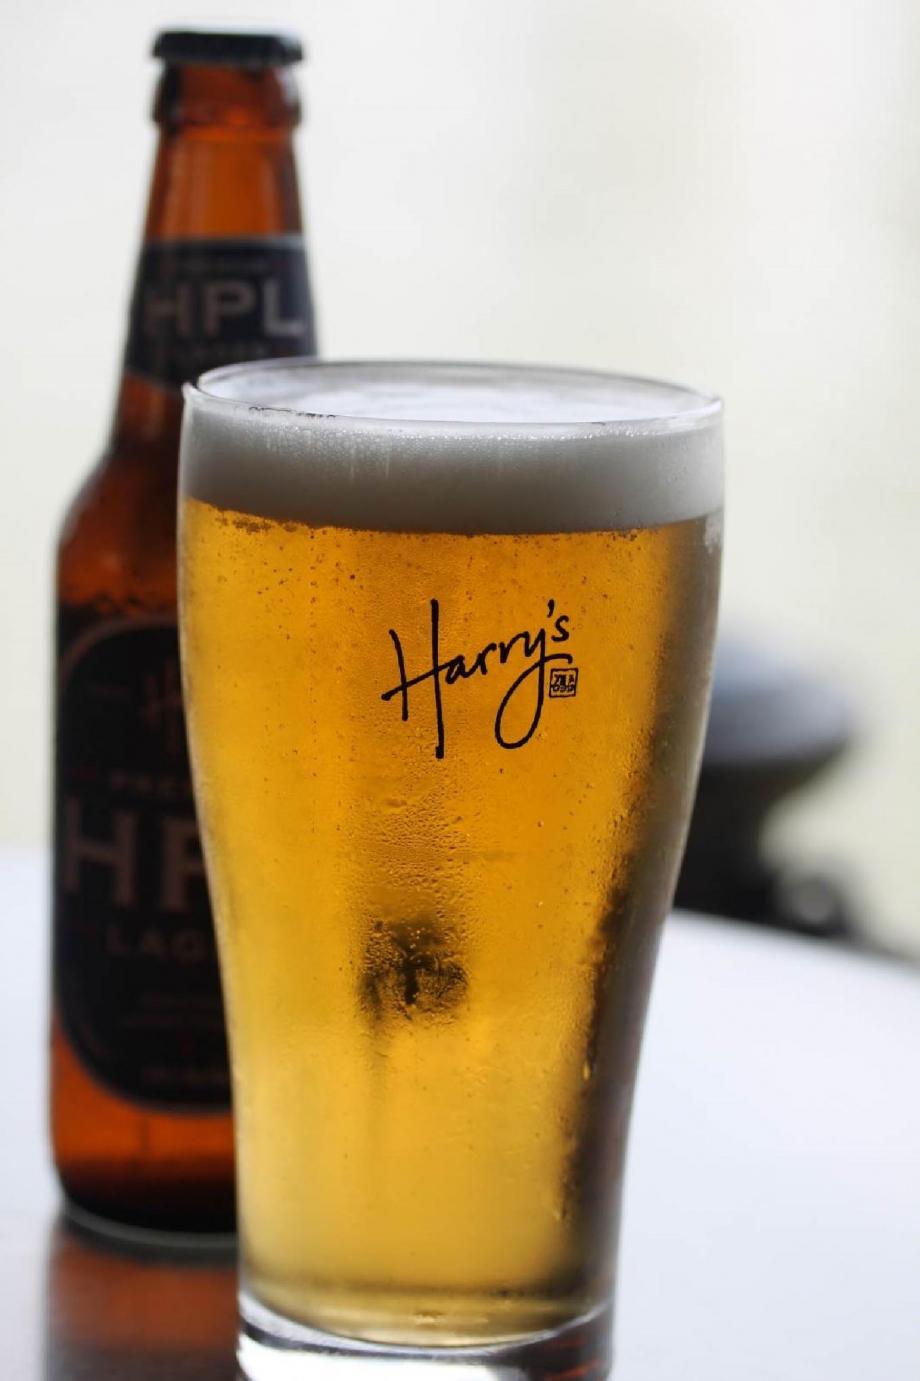 Harry's - Harry's IPA (Indian Pale Ale) - AspirantSG